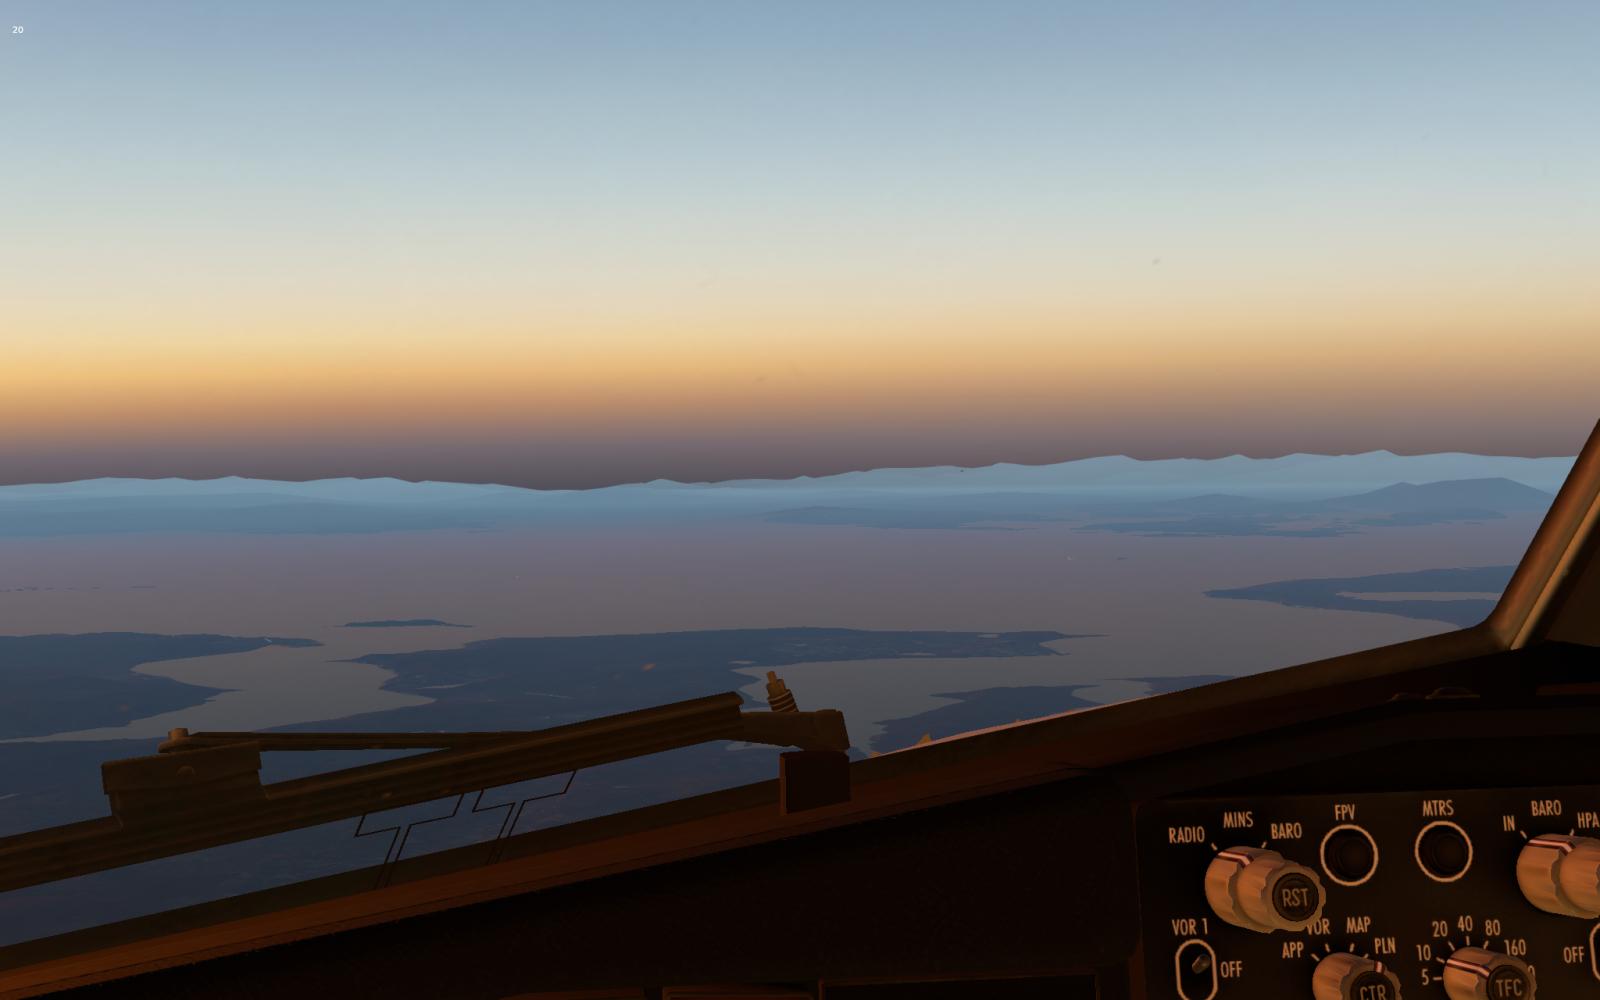 X-Plane 11 horizon bug? (fog/haze) - XP11: Is it a bug ? - X-Plane